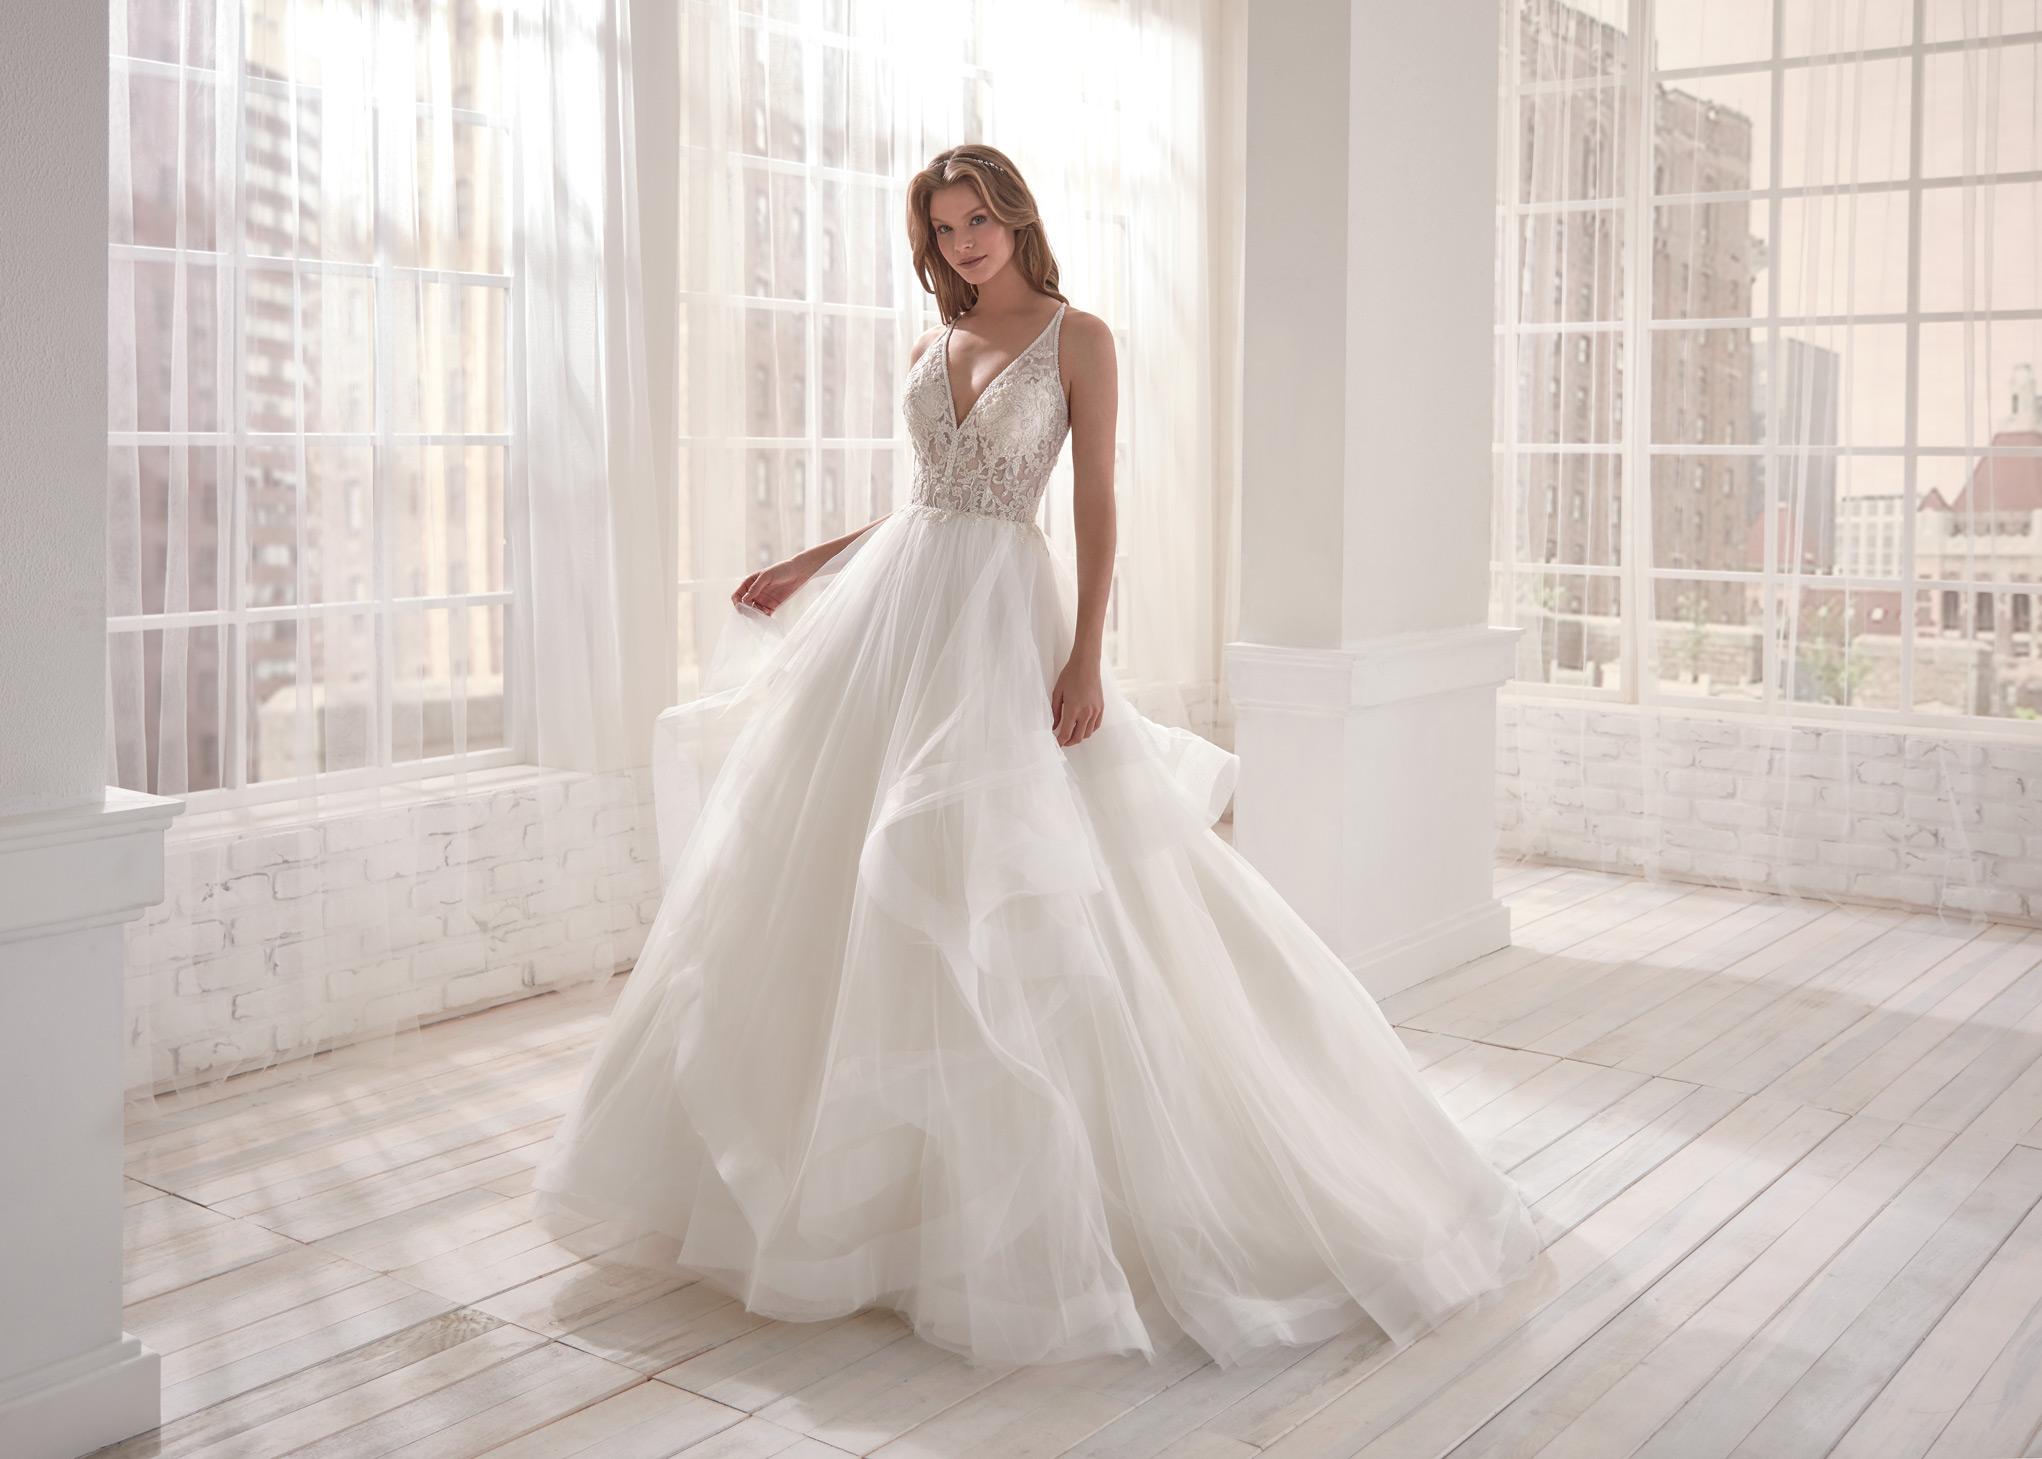 Vestiti Da Sposa Jolies.Abito Da Sposa Jolies 2020 Joa20661 Mariages It Abiti Sposa